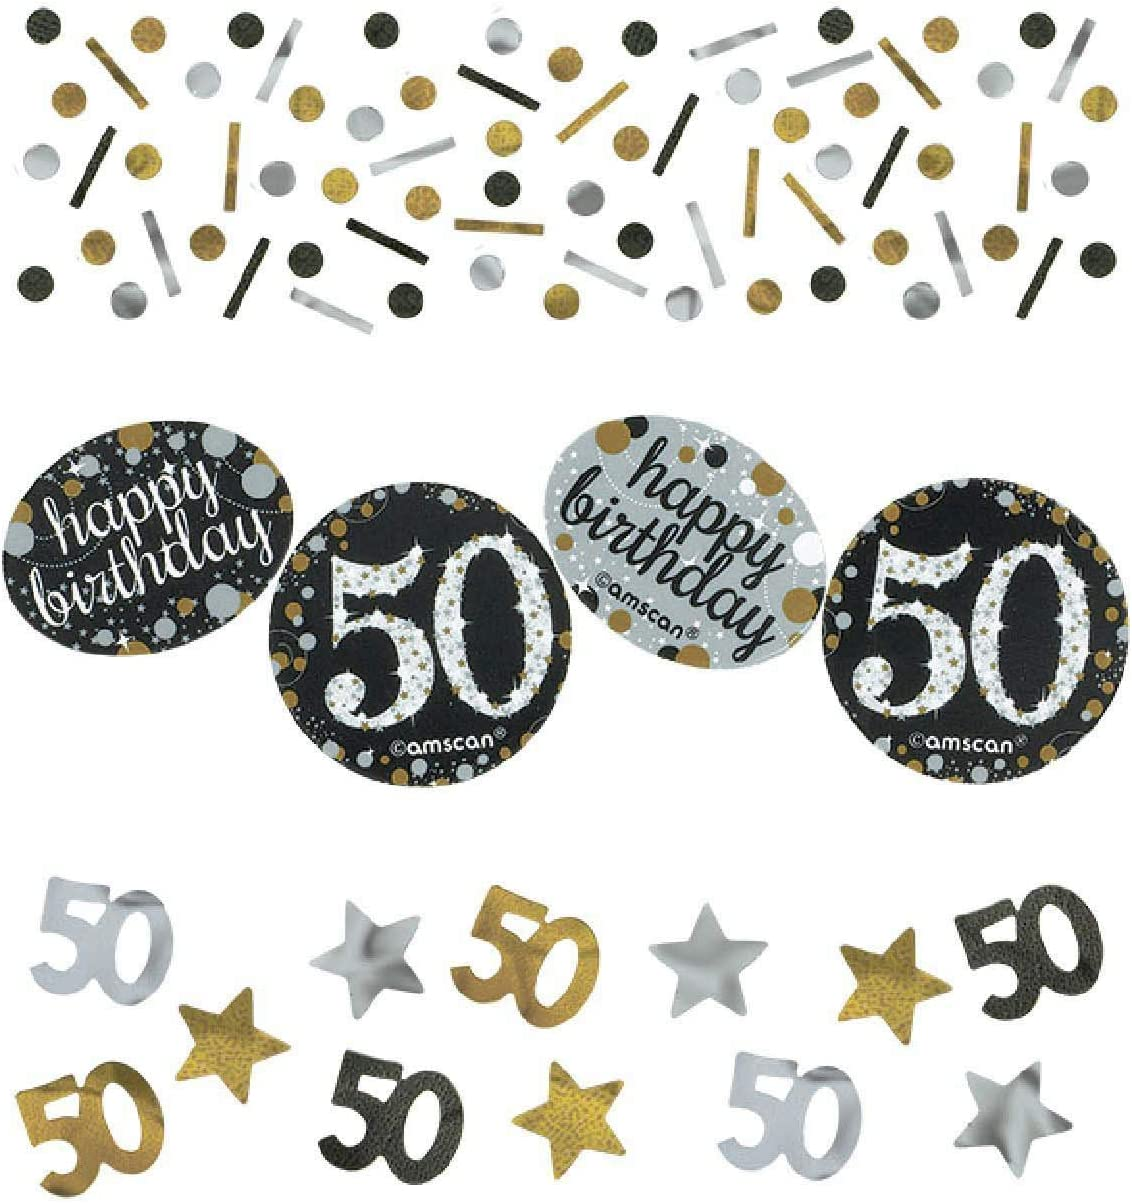 14 g, 50 a/ños Confeti para decoraci/ón de mesa color dorado Gifts 4 All Occasions Limited SHATCHI-171